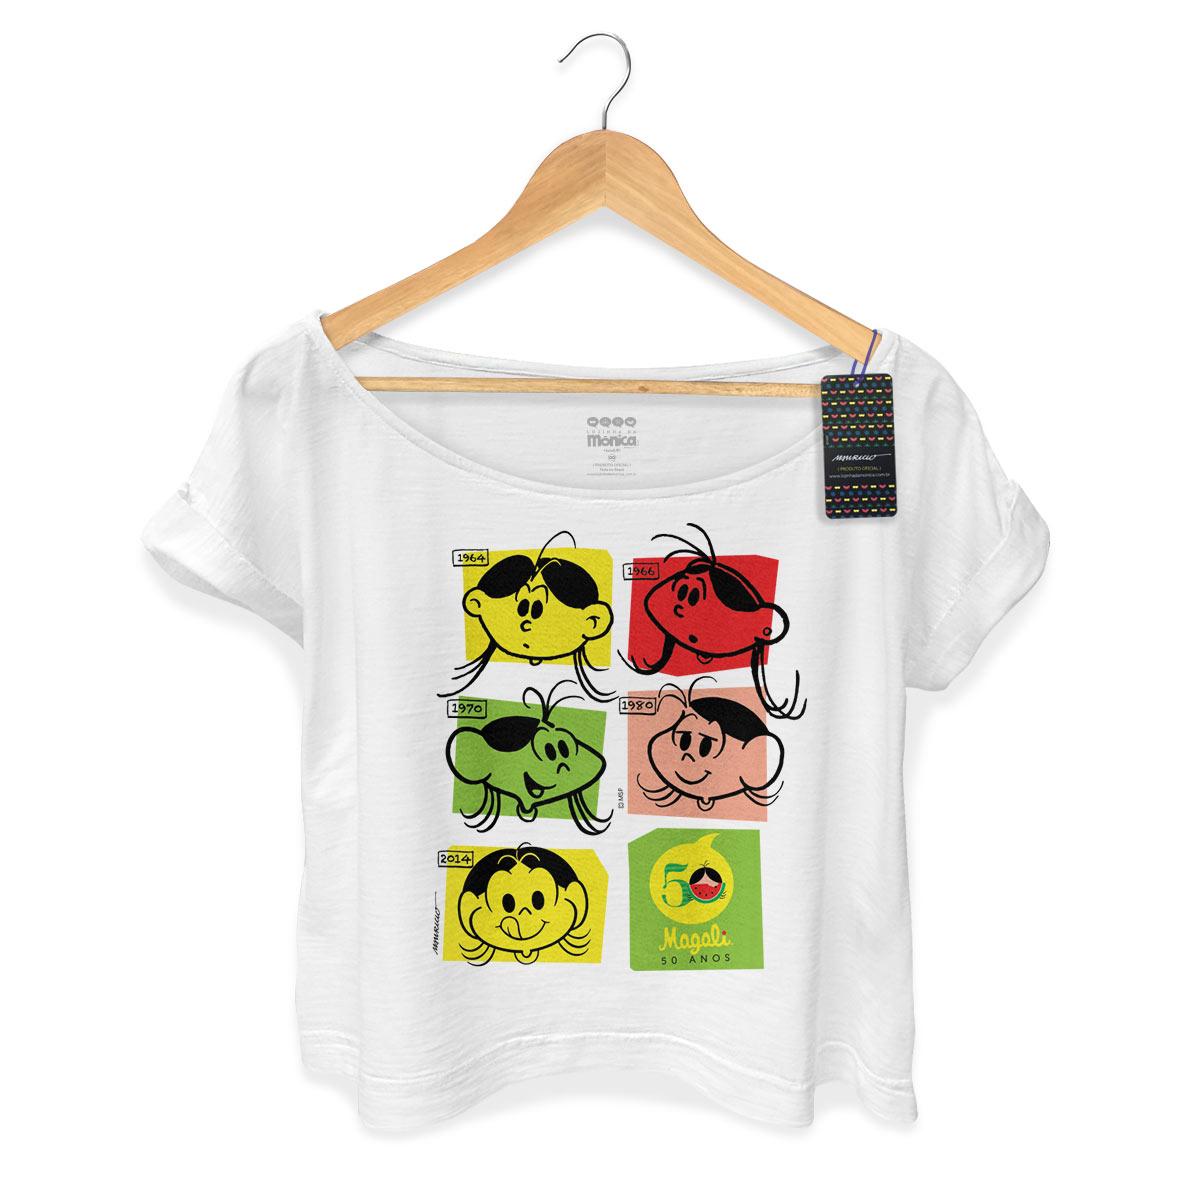 T-shirt Feminina Premium Magali 50 Anos Evolu��o Colors